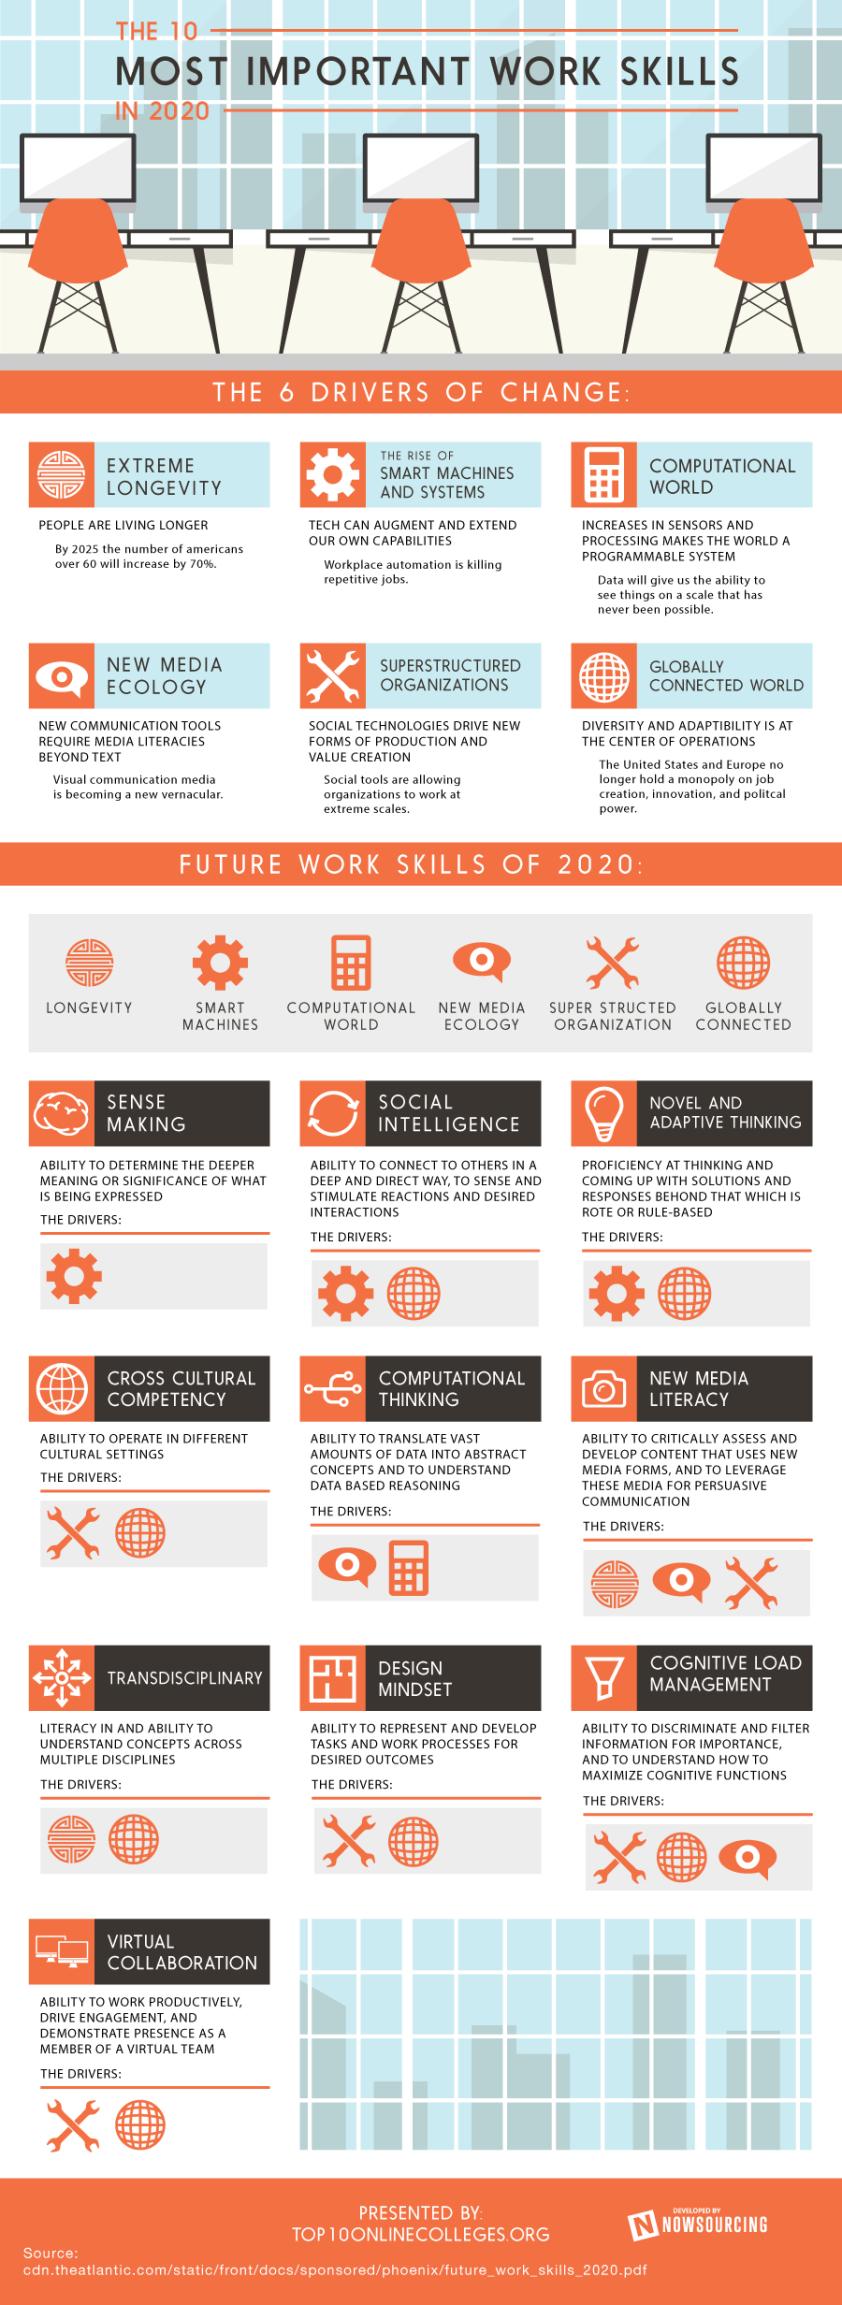 2020 work skills